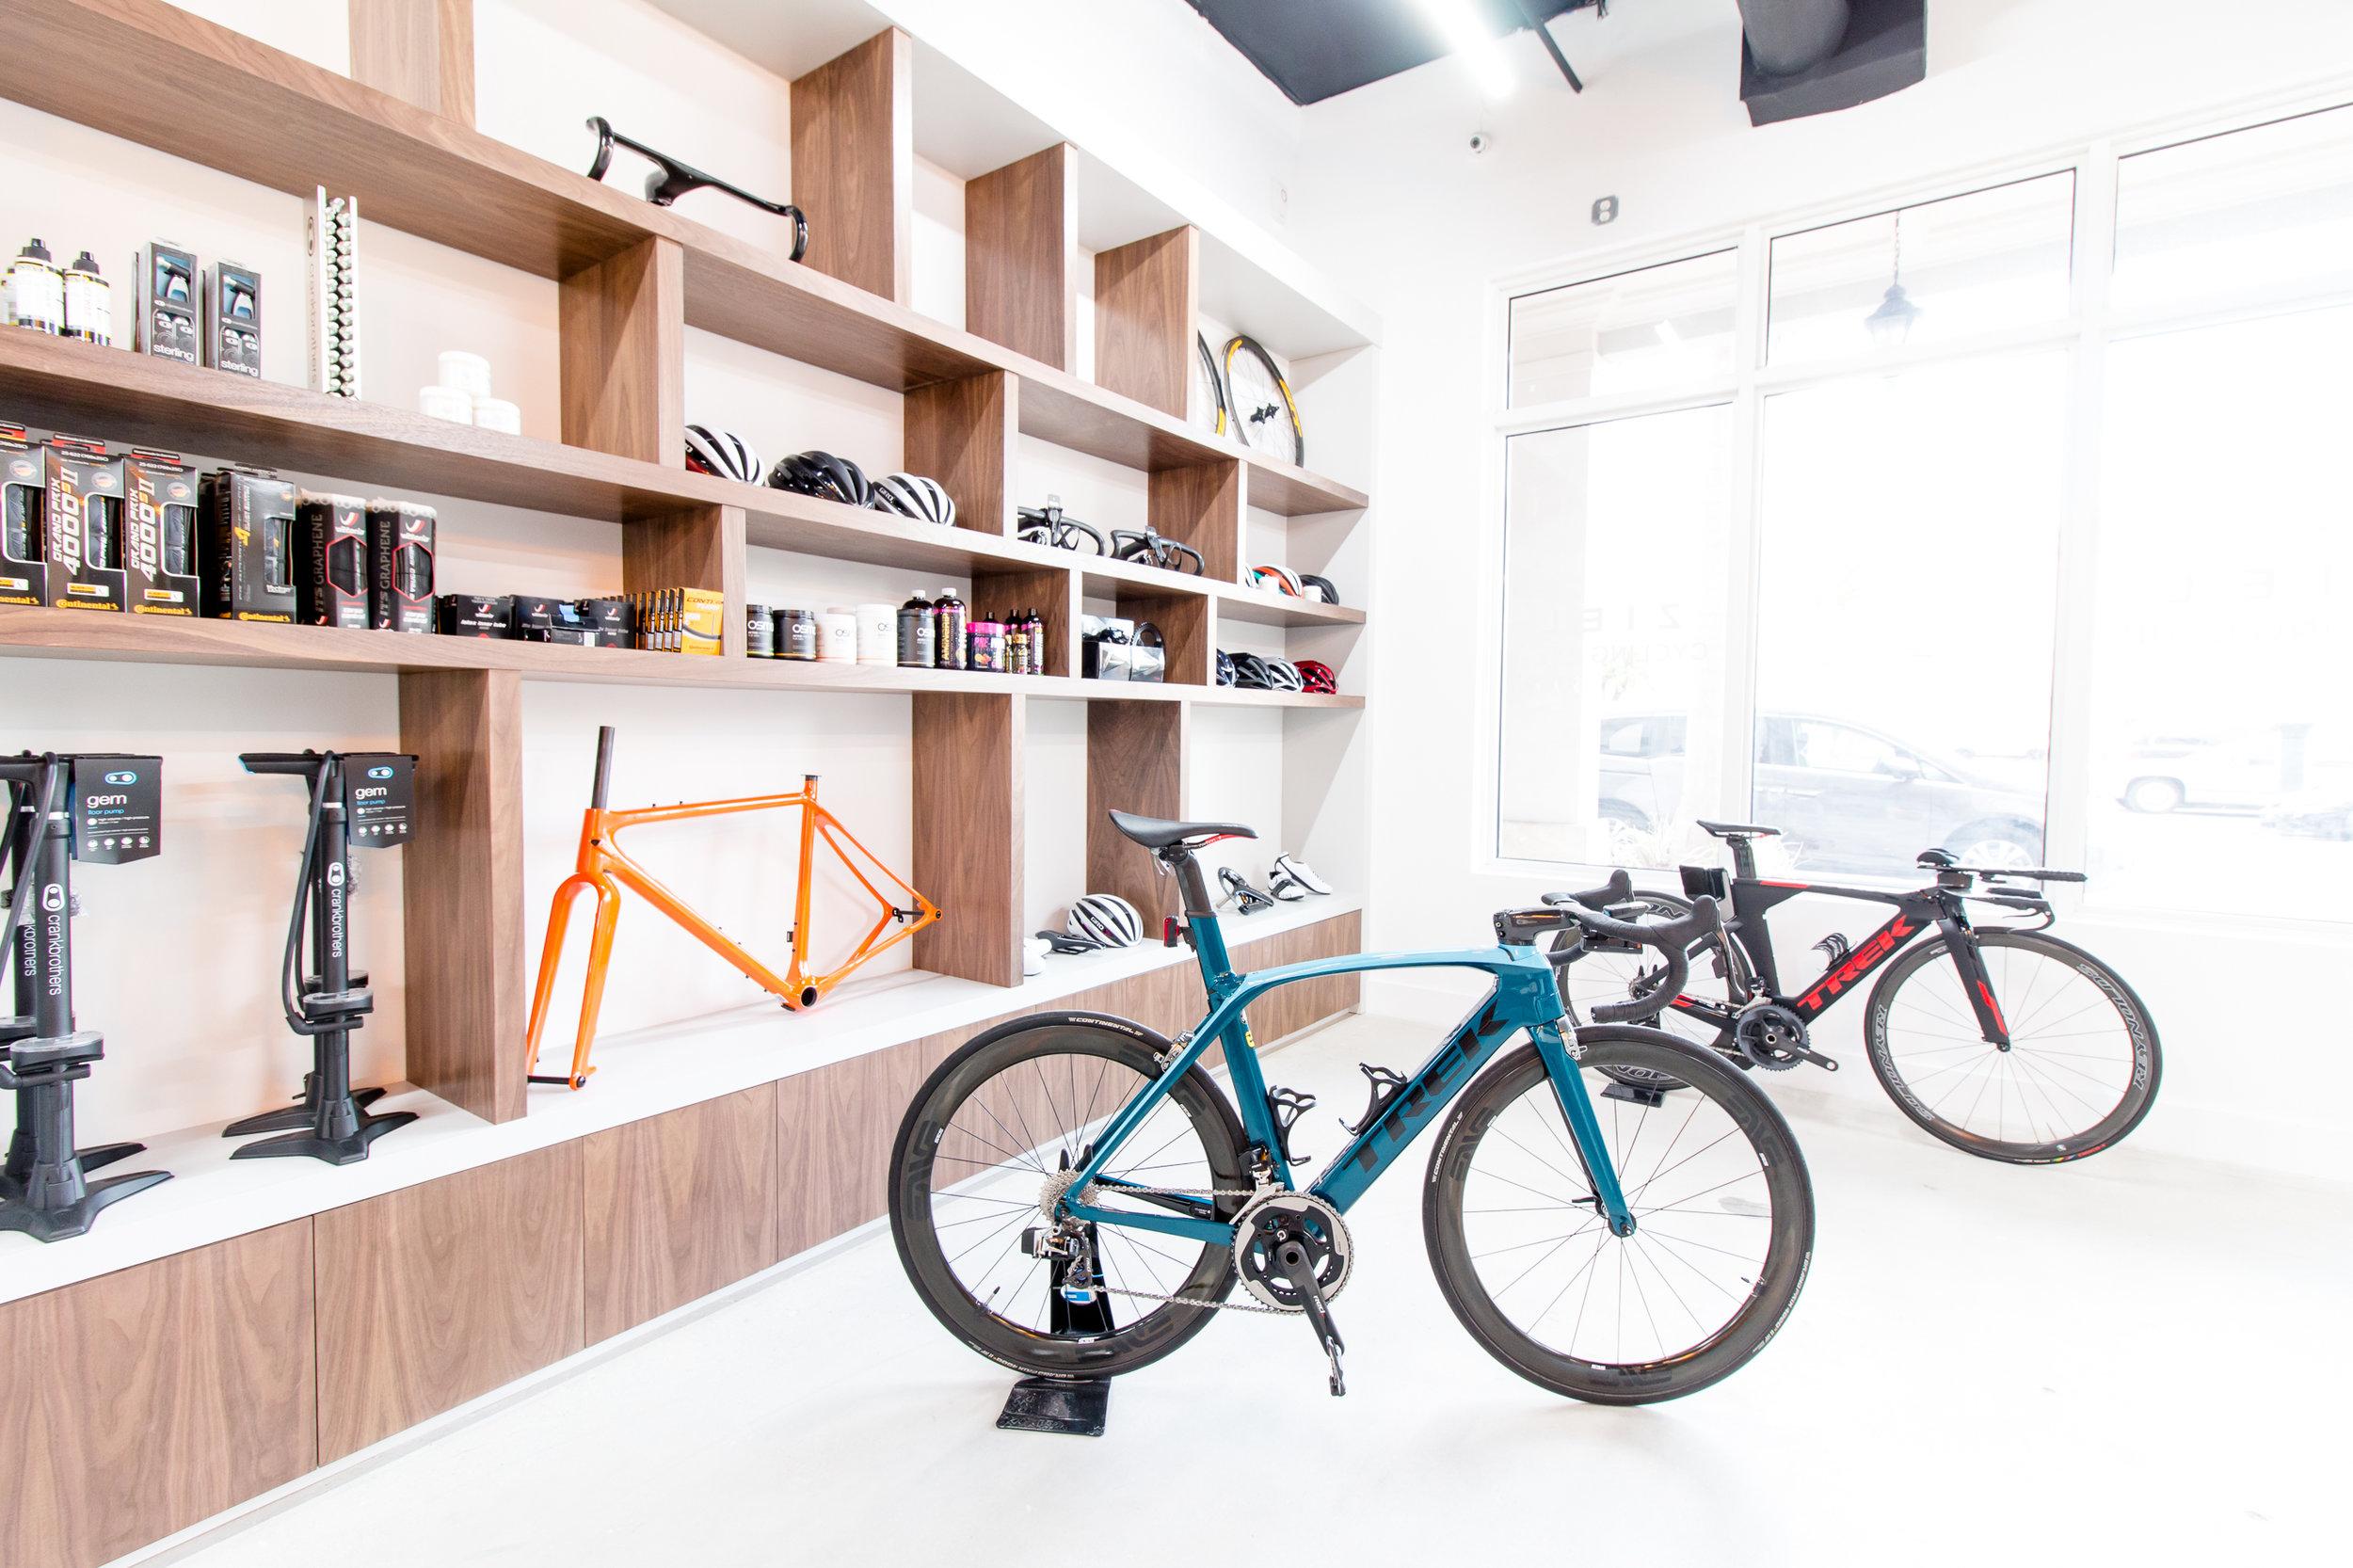 ZielCC_CoralGables_BikeShop_MRCC-1.jpg